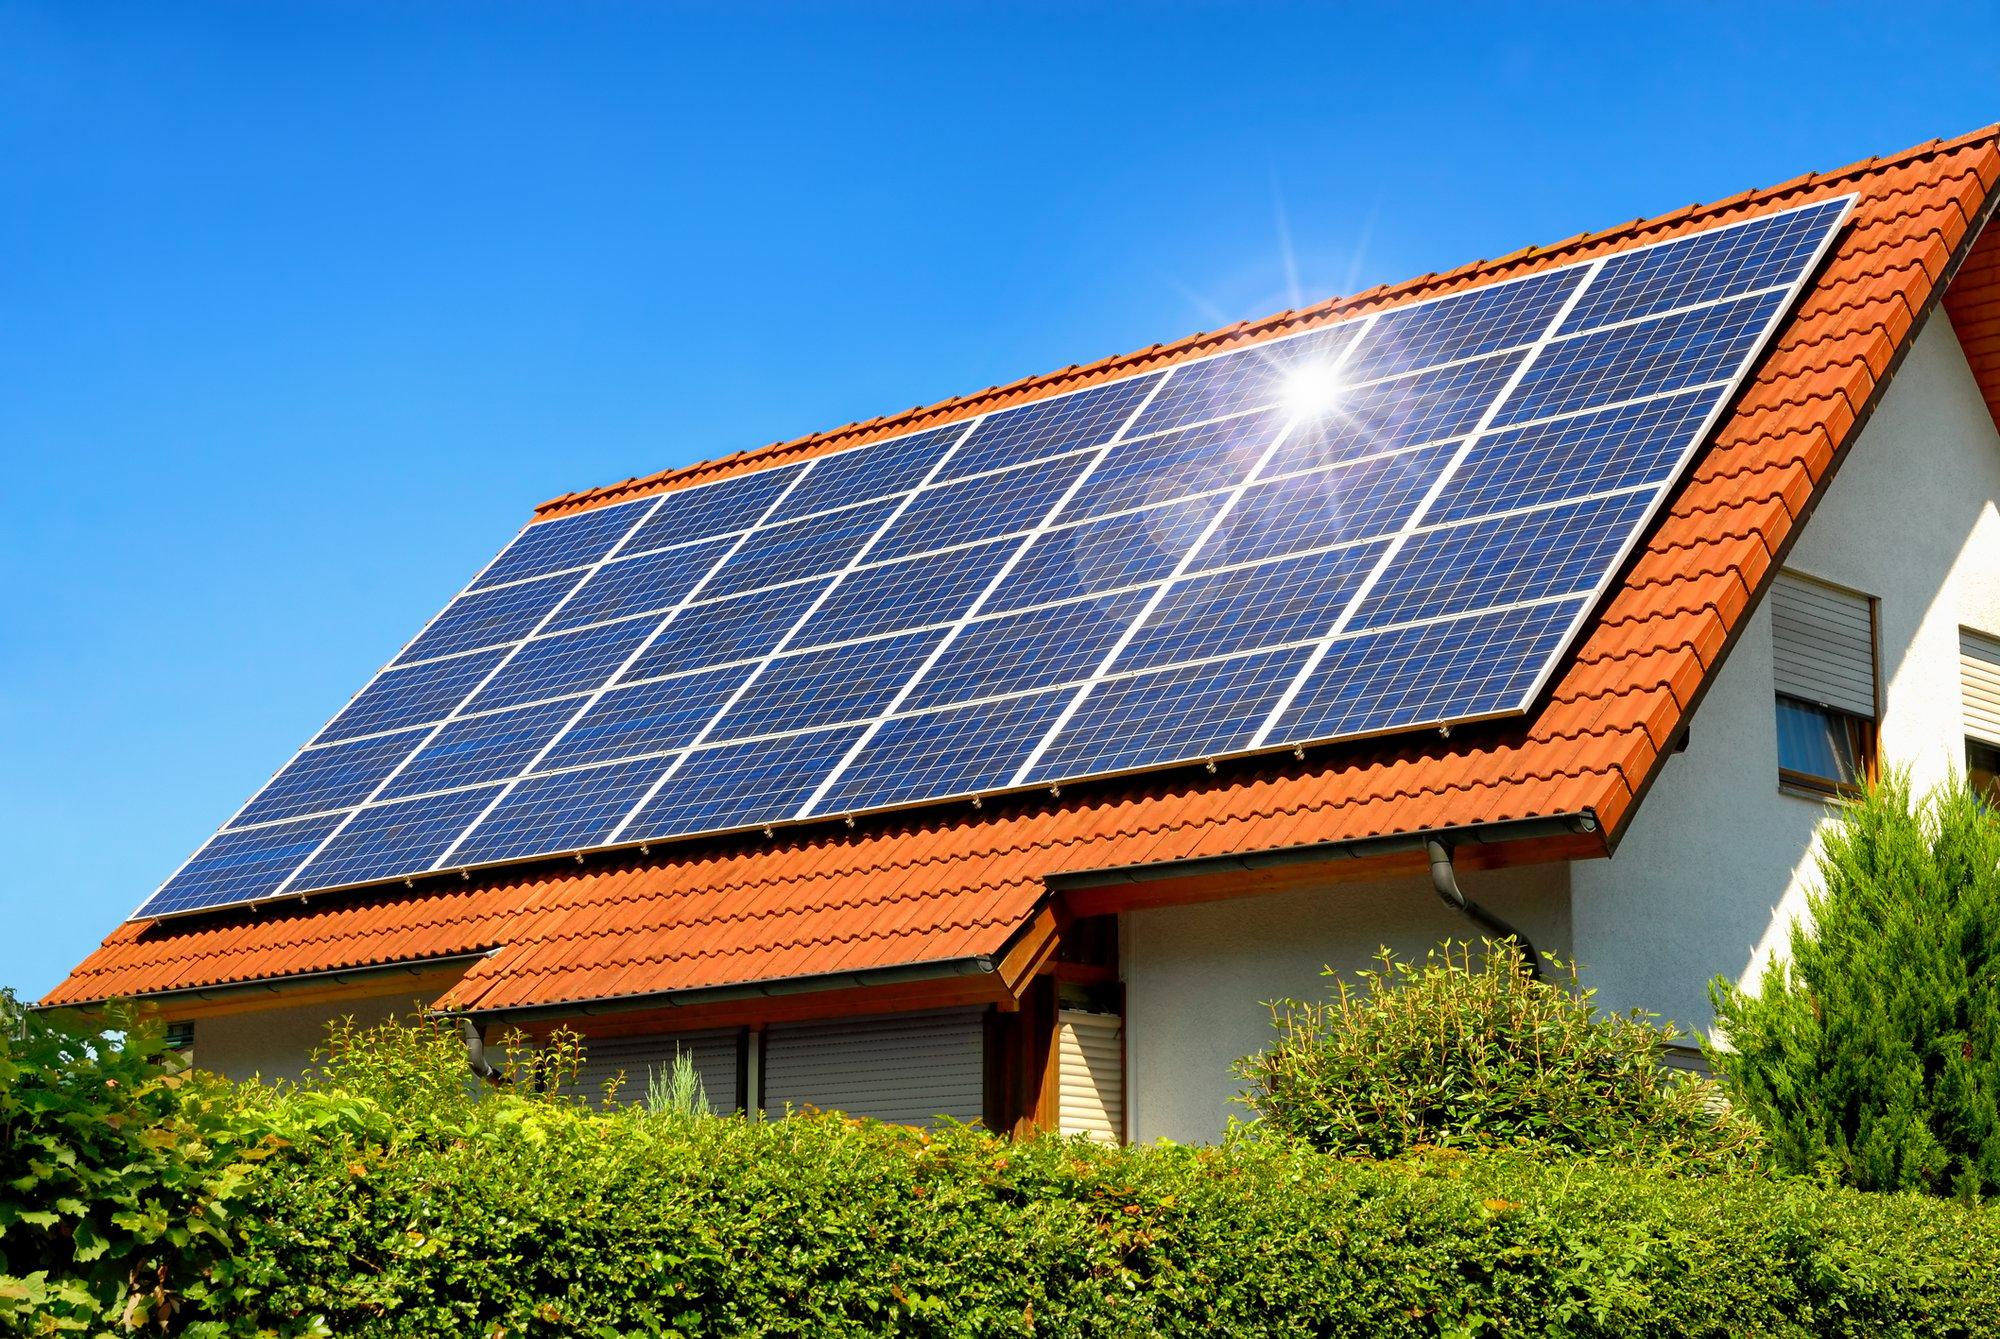 3 Solar Stocks Making Big Oil Obsolete